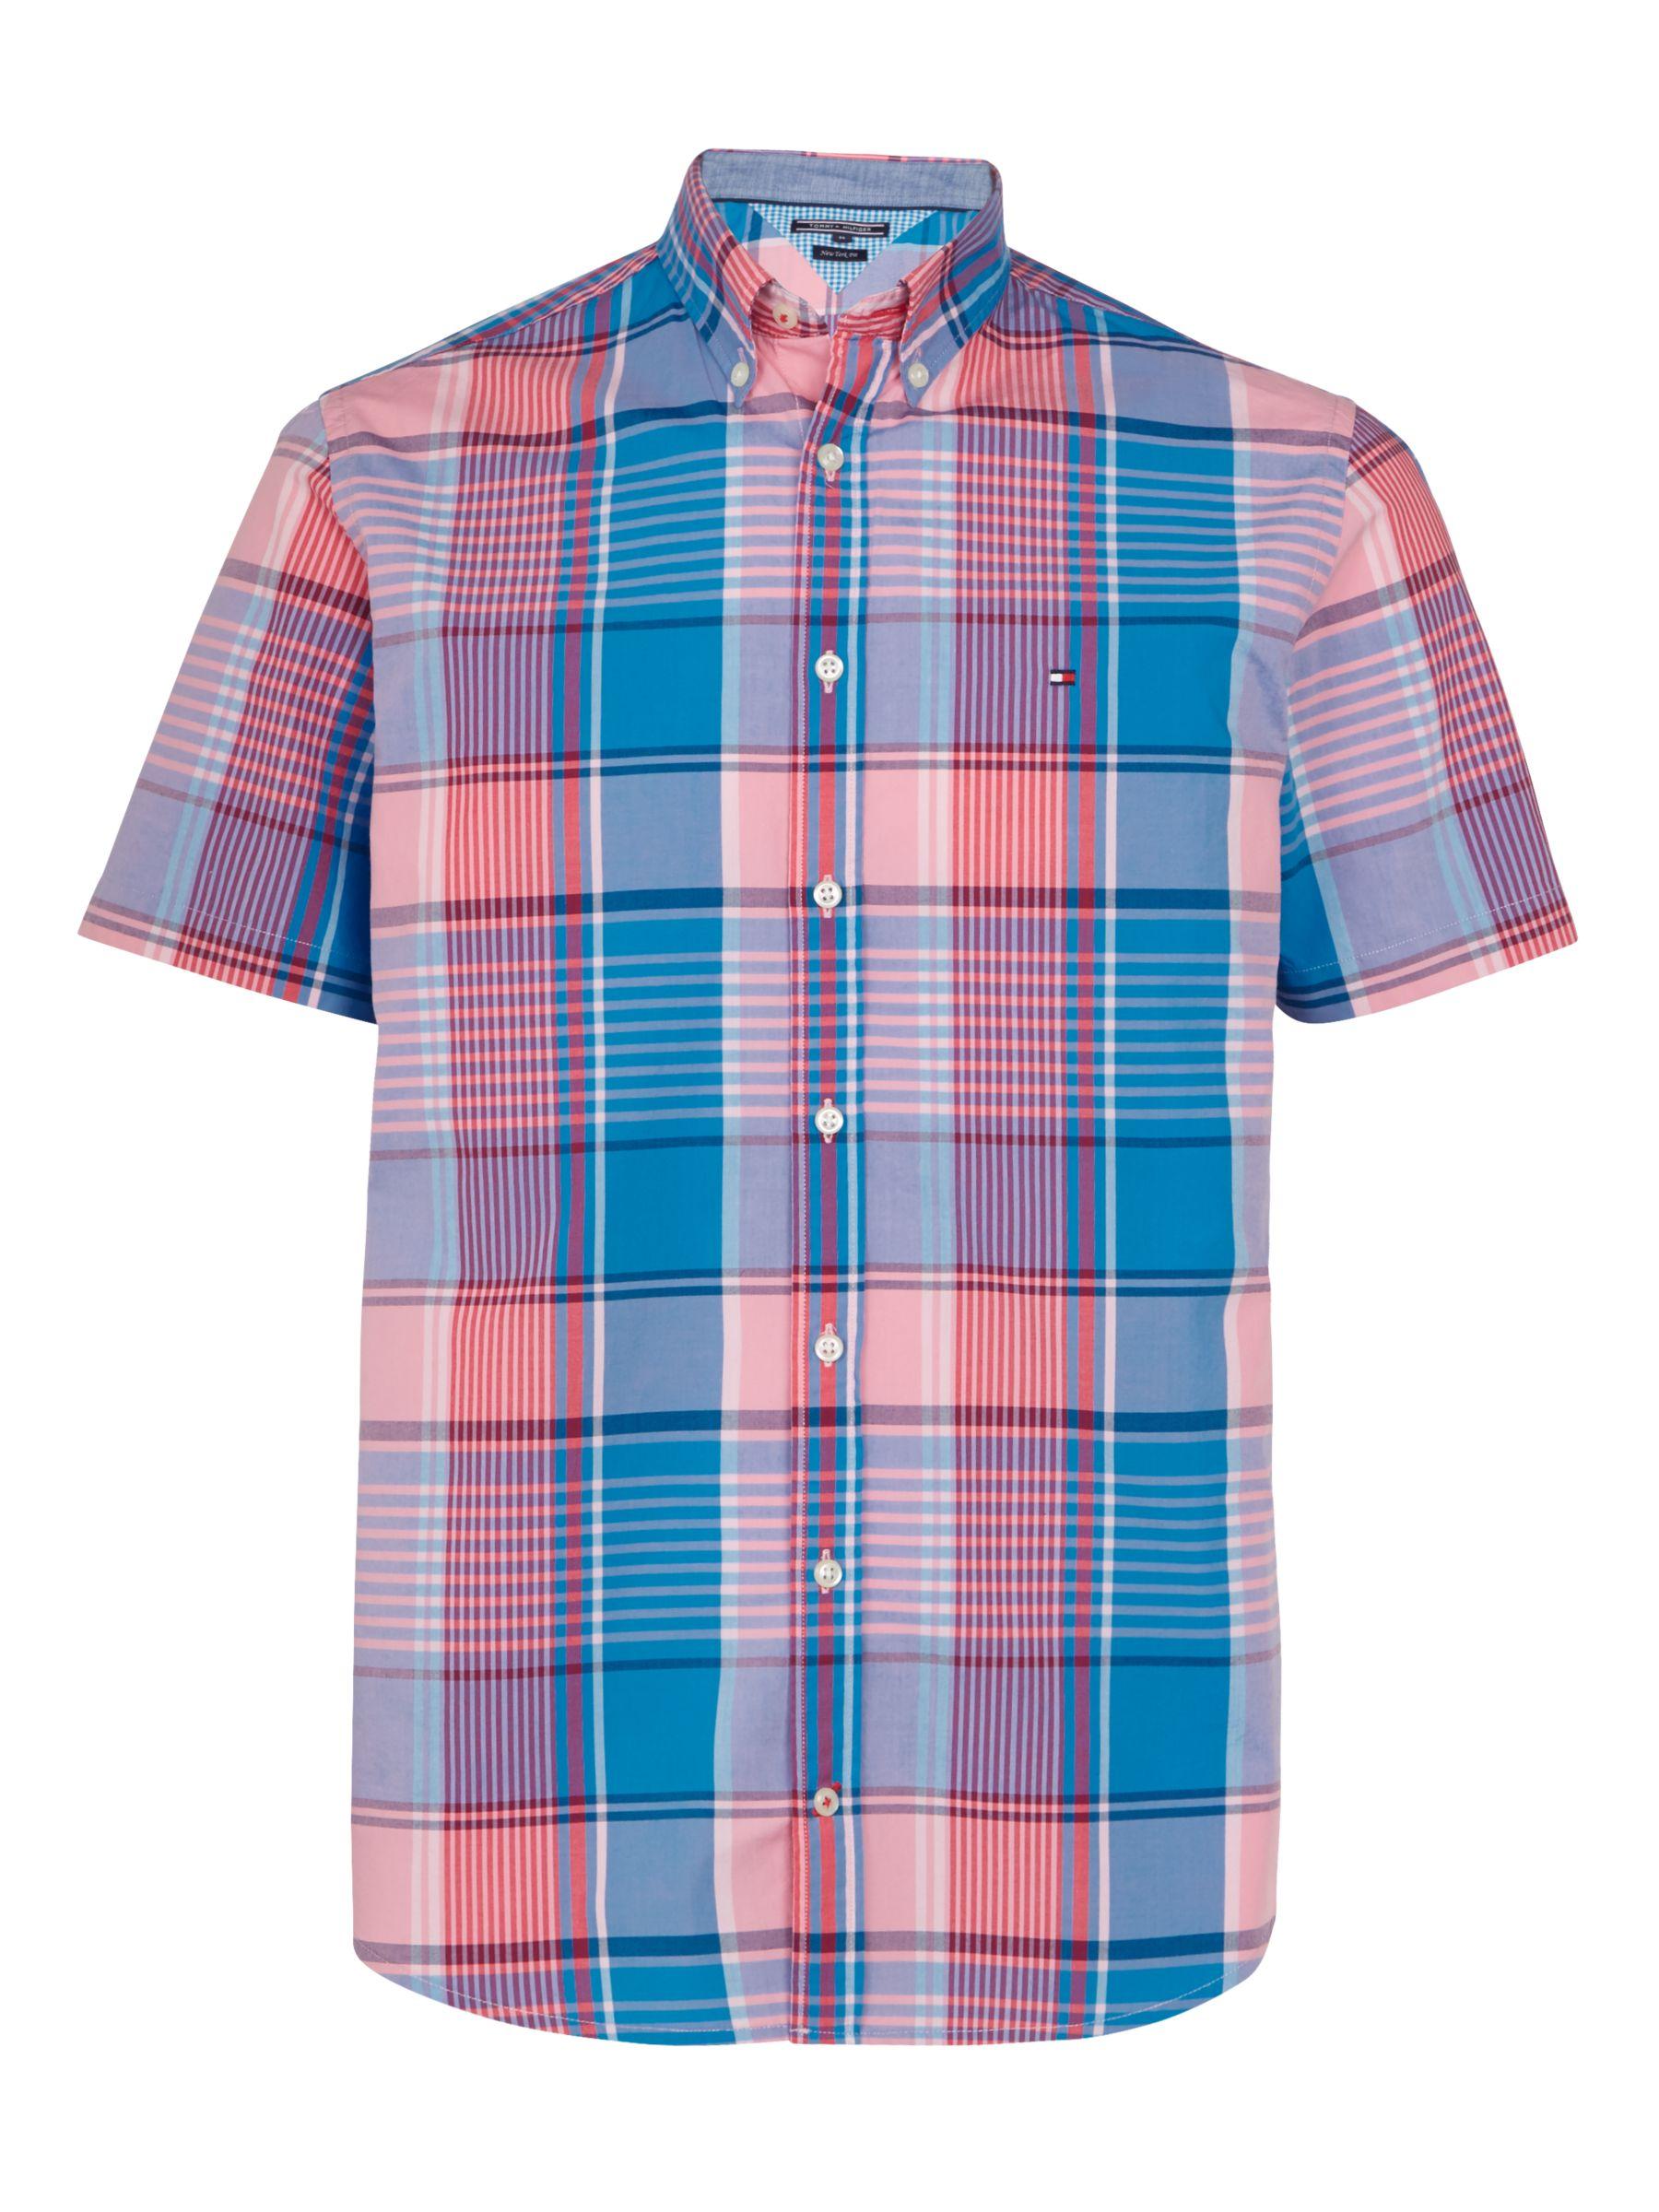 Tommy Hilfiger O Connor Short Sleeve Shirt c035768100c00